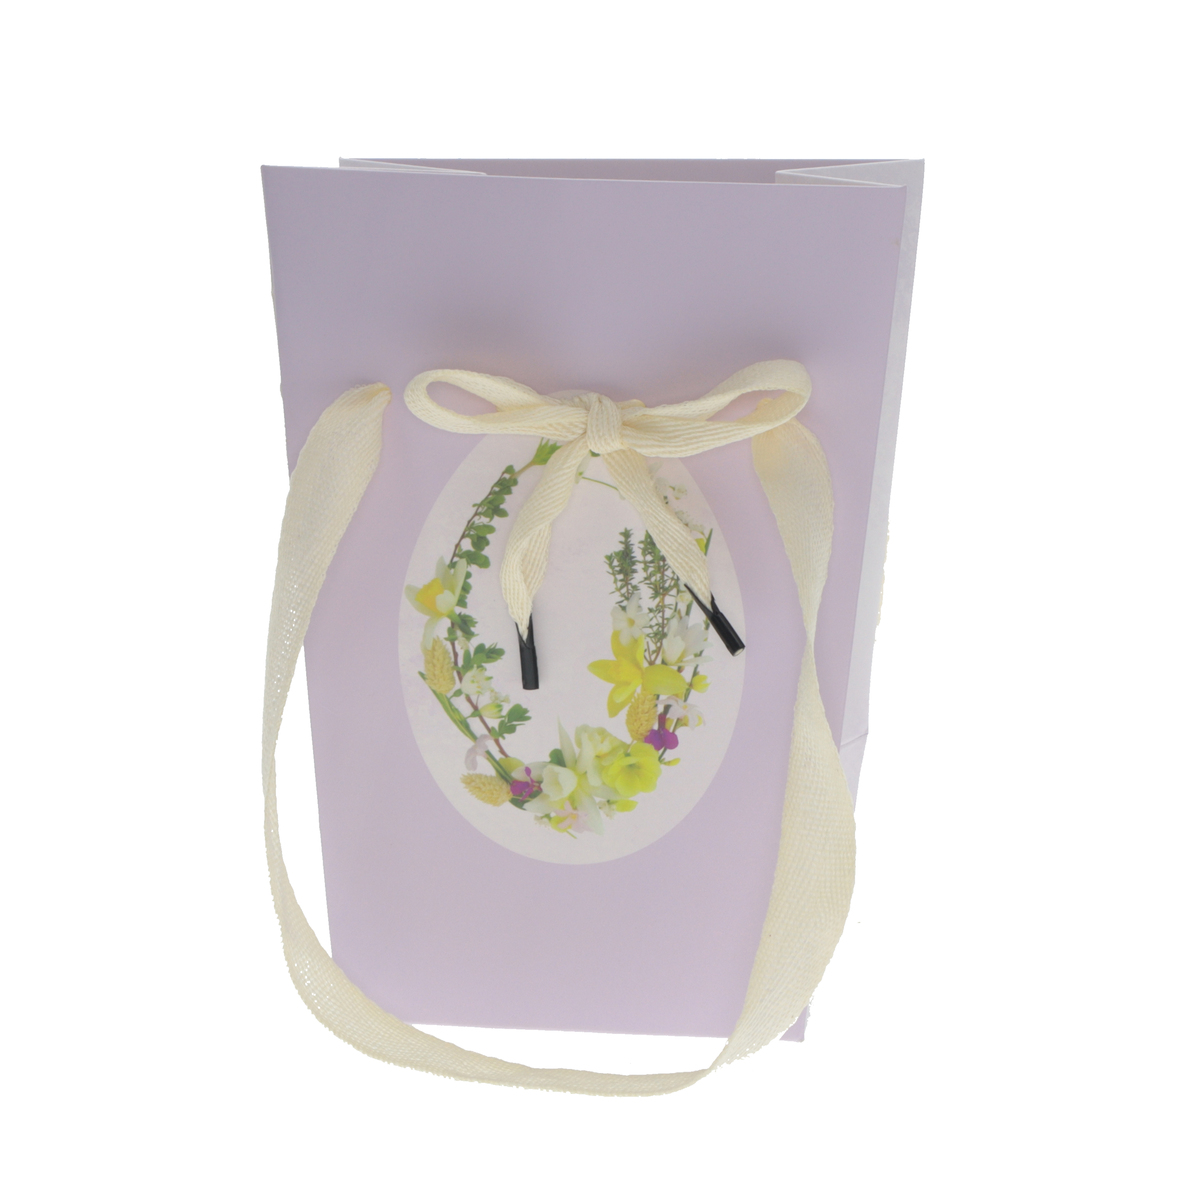 Carrybag Easter Decoration 15 15x11x20cm Fsc Mix Lilac